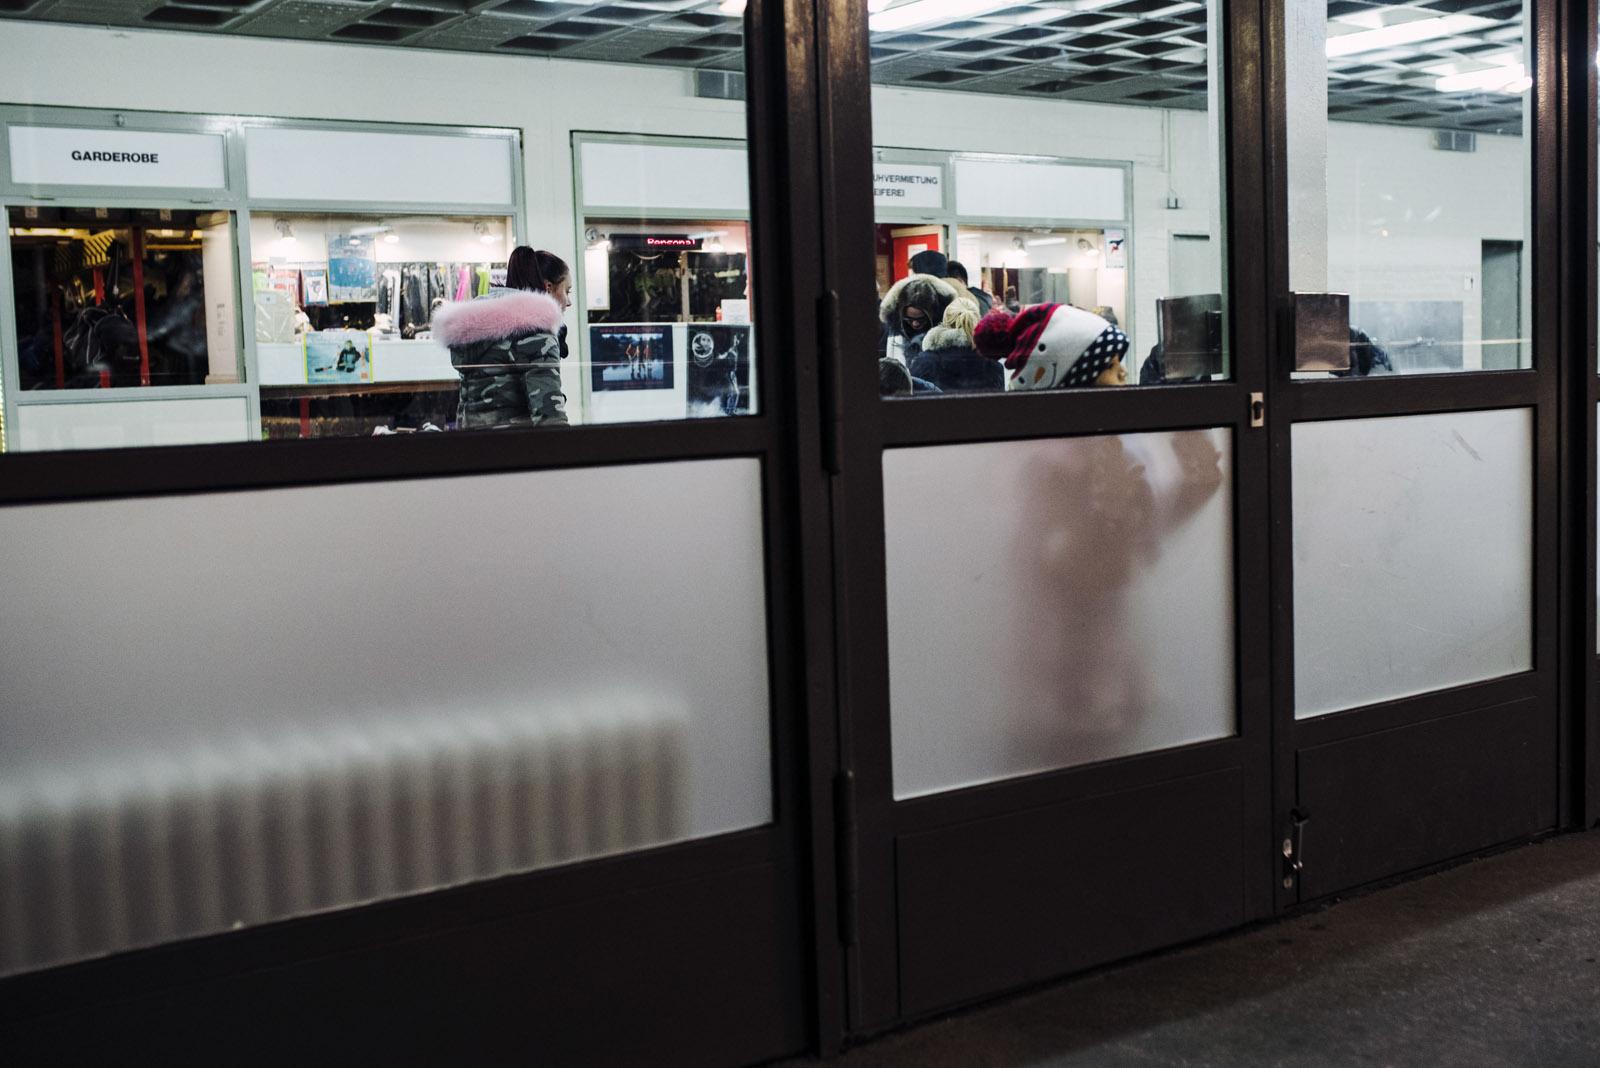 Z² – Zahn und Zieger | Erika-Heß-Eisstadion | Outfit | ARMEDANGELS & Nudie Jeans & VEJA | Fotostory | Foto: René Zieger | GROSS∆RTIG